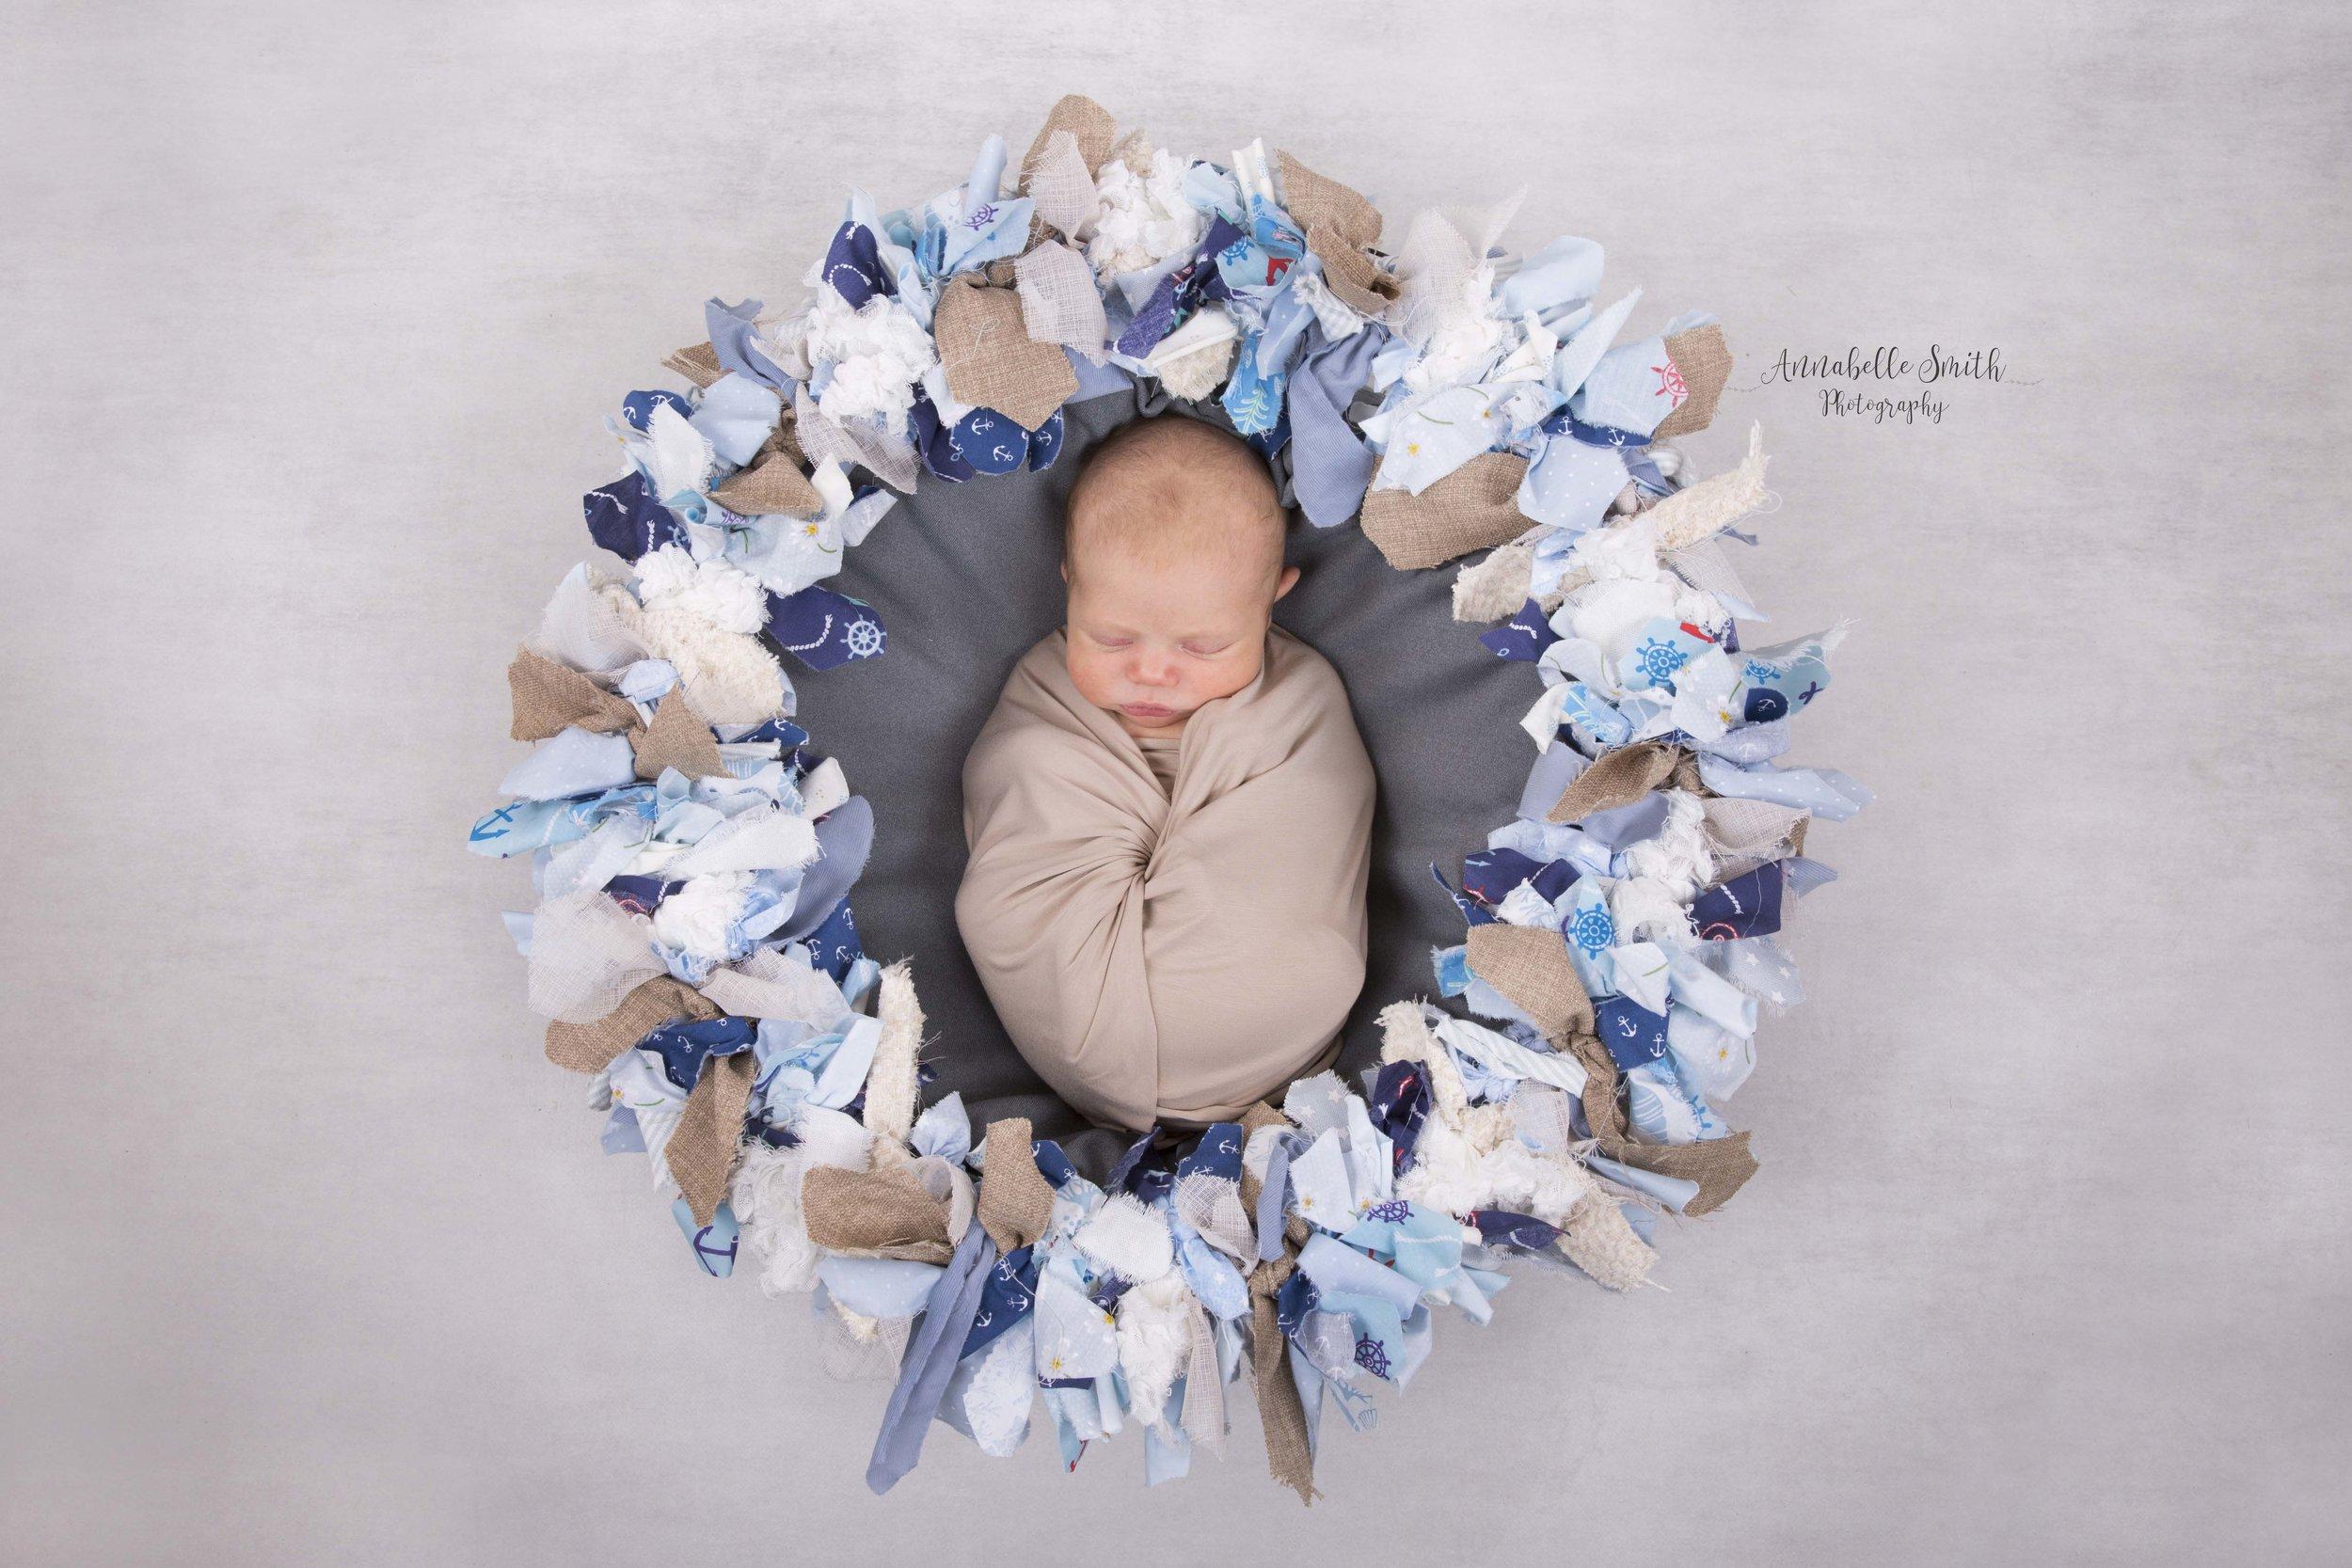 Newborn photography walton on thames surrey KT12.jpg